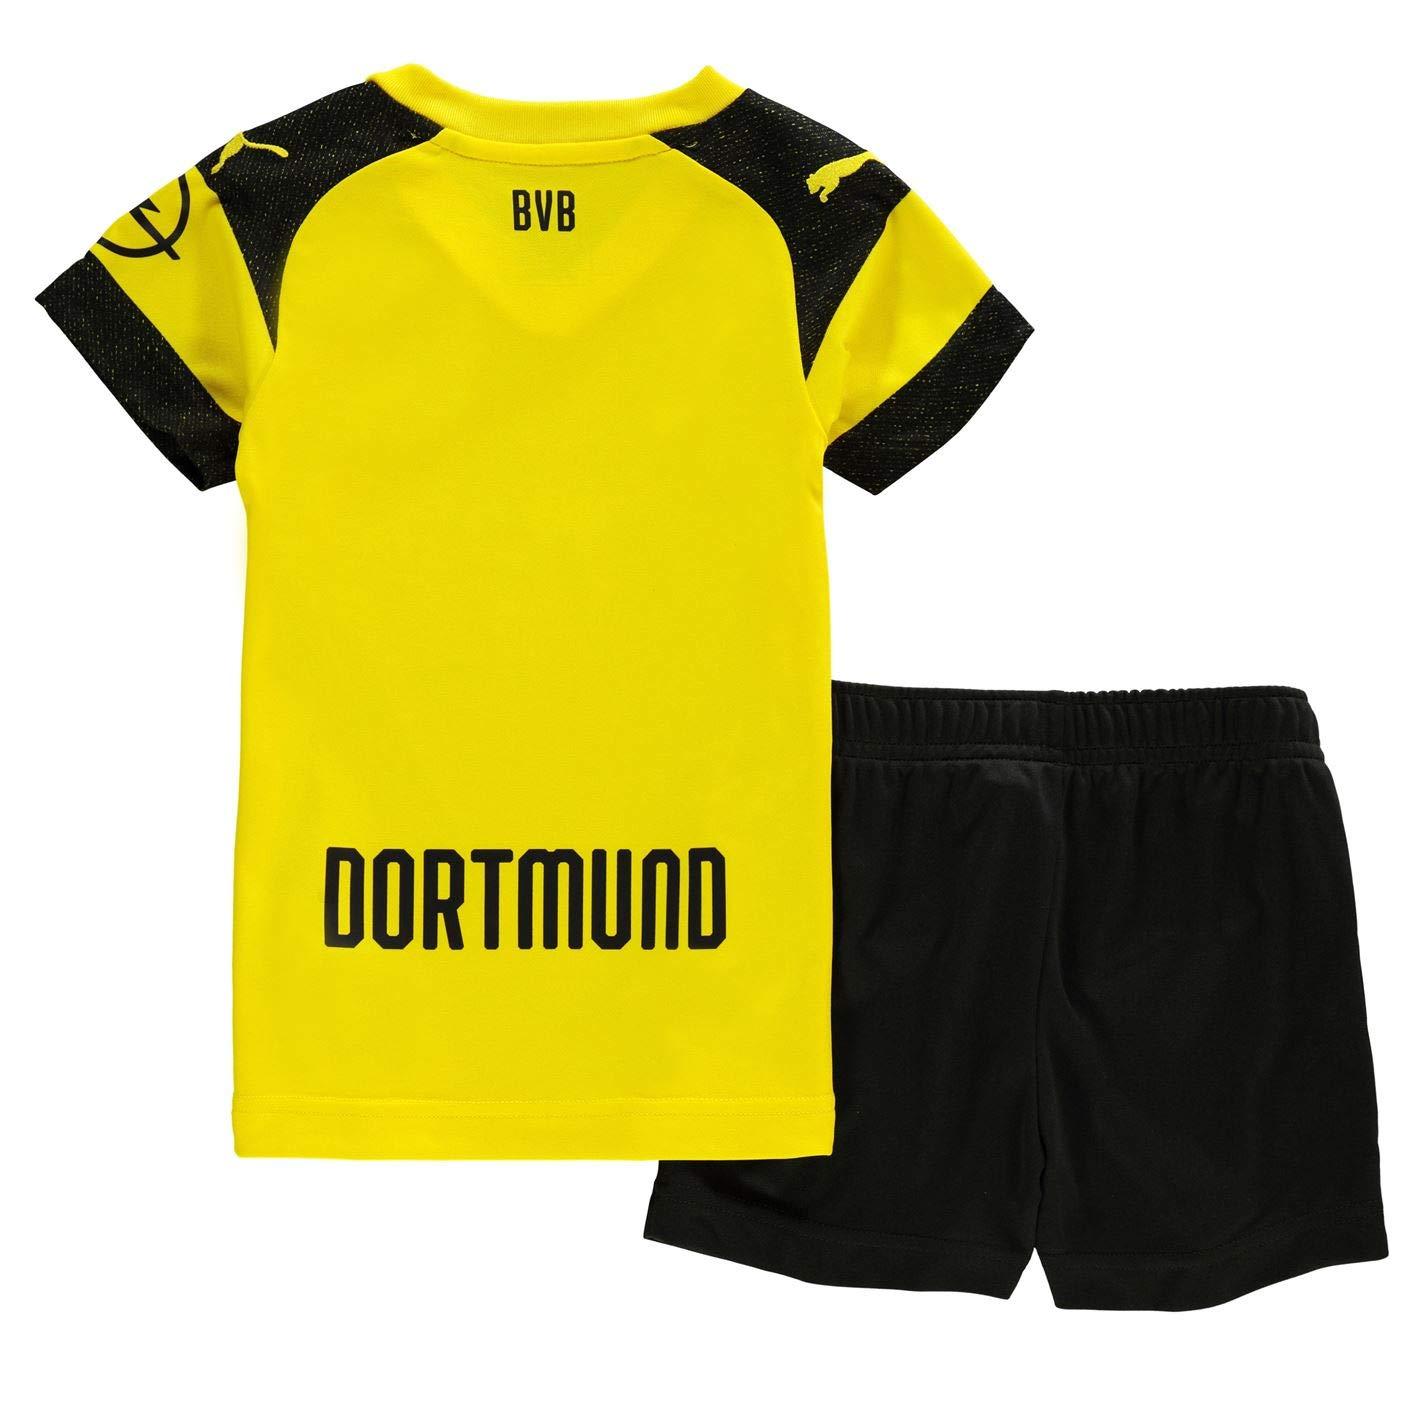 Amazon.com : PUMA 2018-2019 Borussia Dortmund Home Little ...